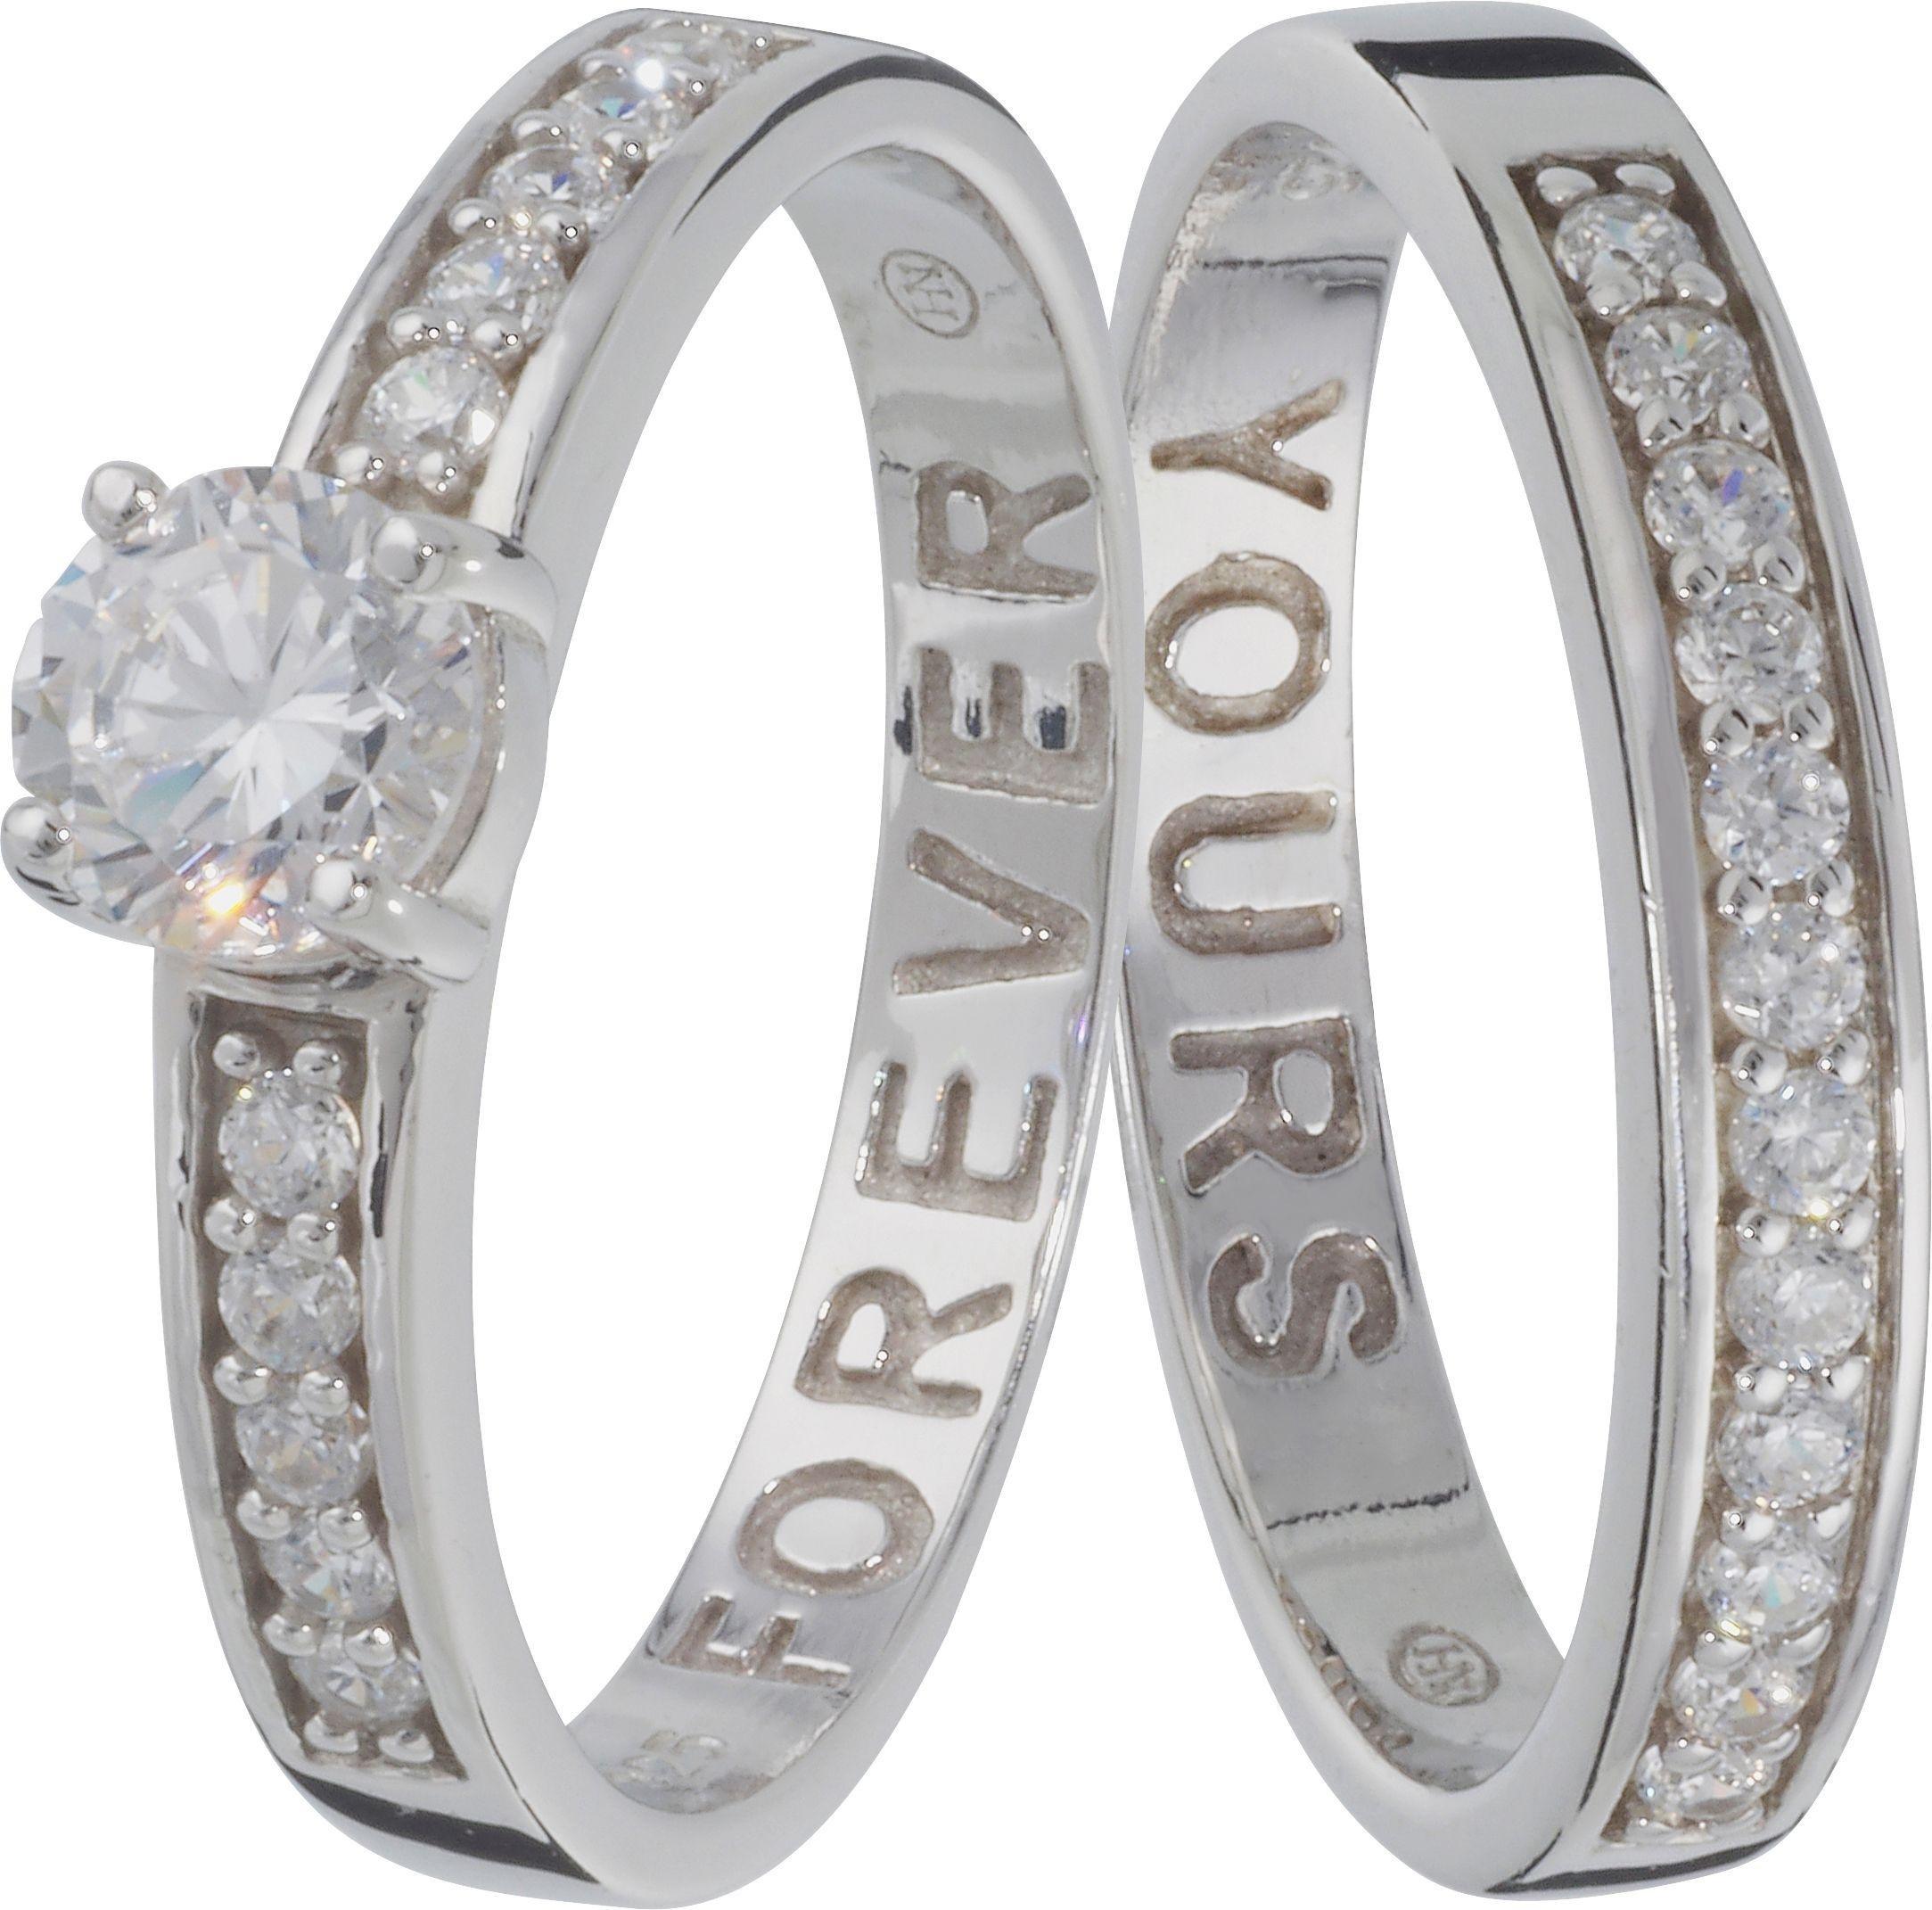 Buy Moon & Back Sterling Silver Cubic Zirconia Eternity Ring Set